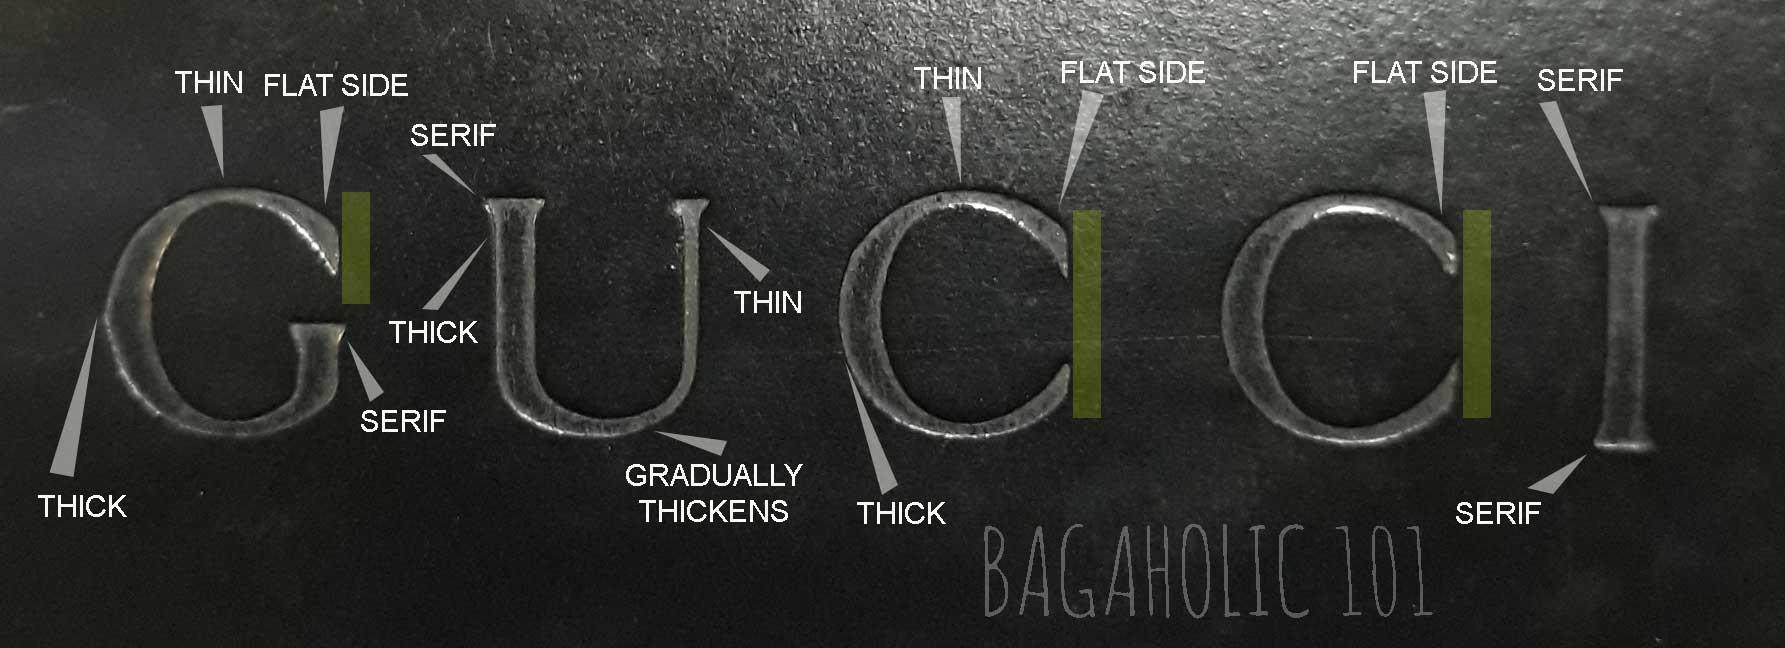 Anatomy of a Gucci logo font.